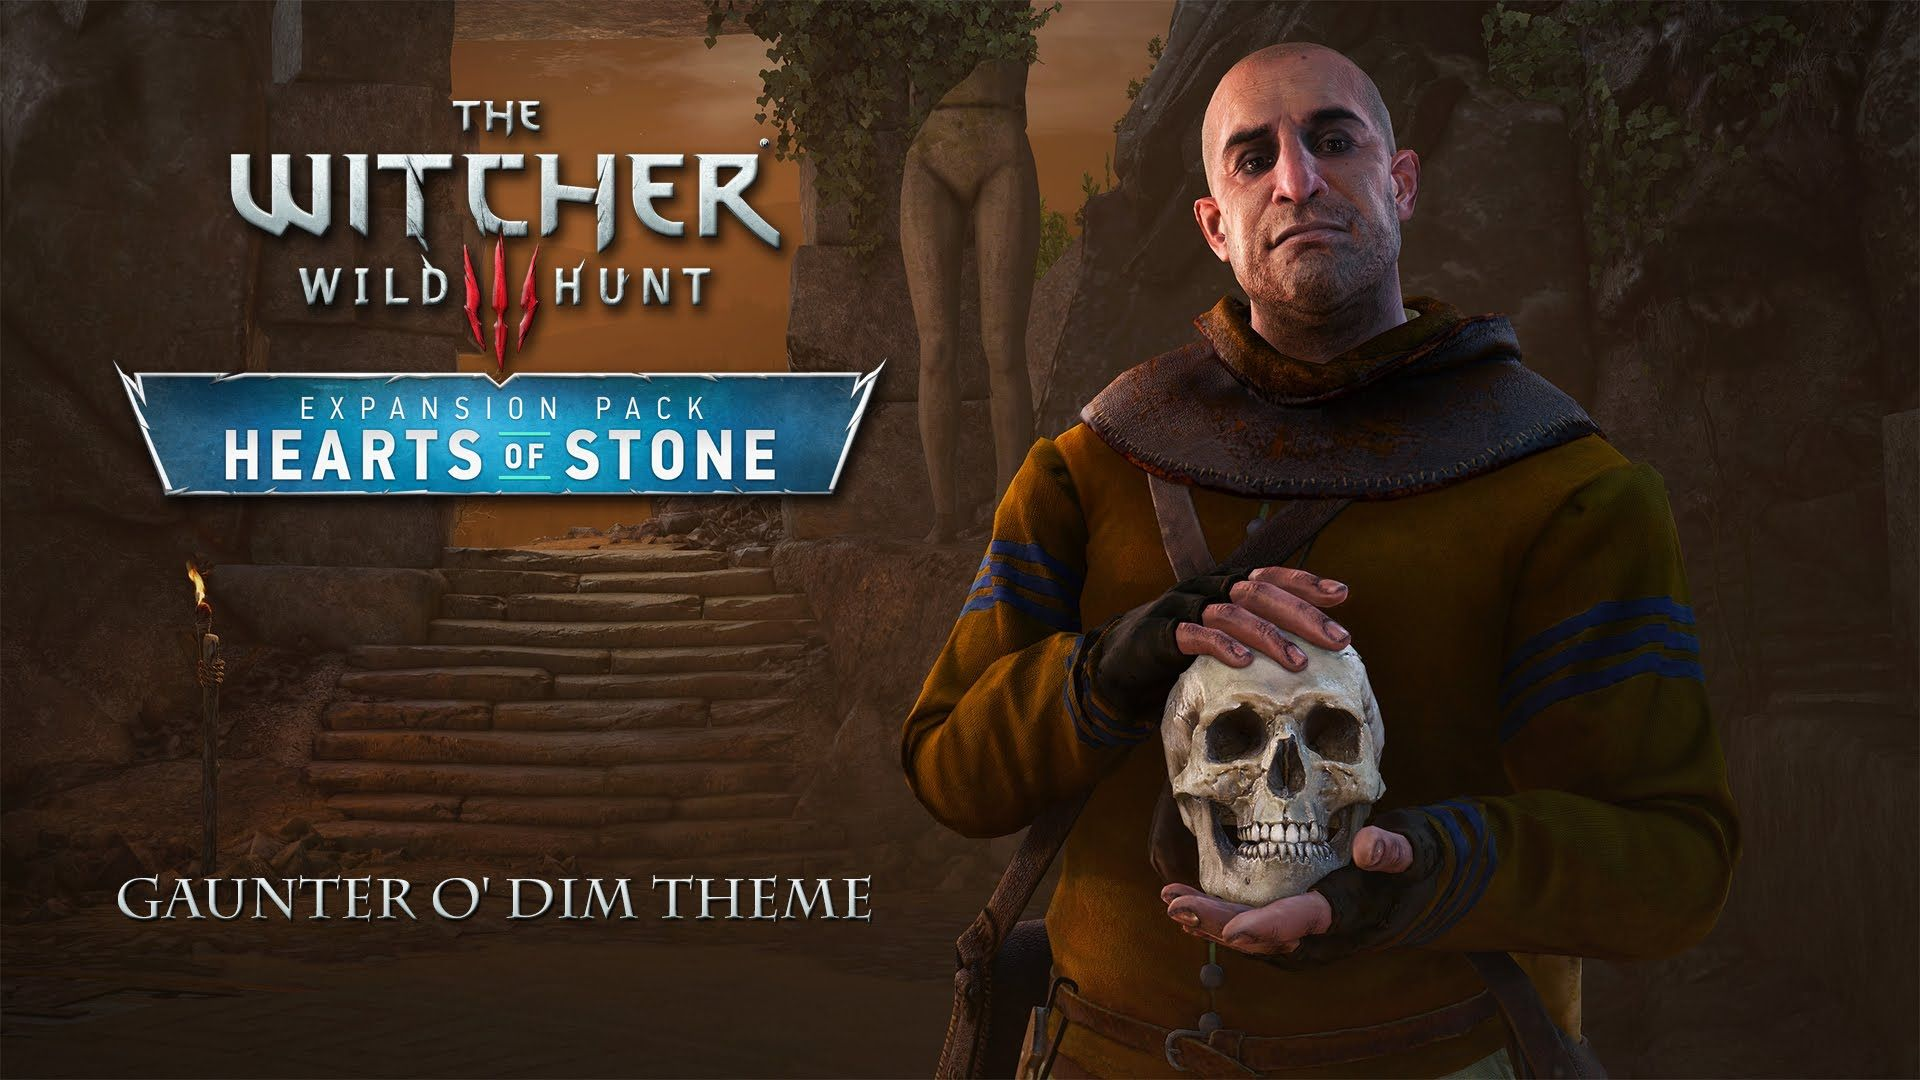 Gaunter O Dim Theme The Witcher 3 Wild Hunt Hearts Of Stone The Witcher Hearts Of Stone Gaunter O Dimm